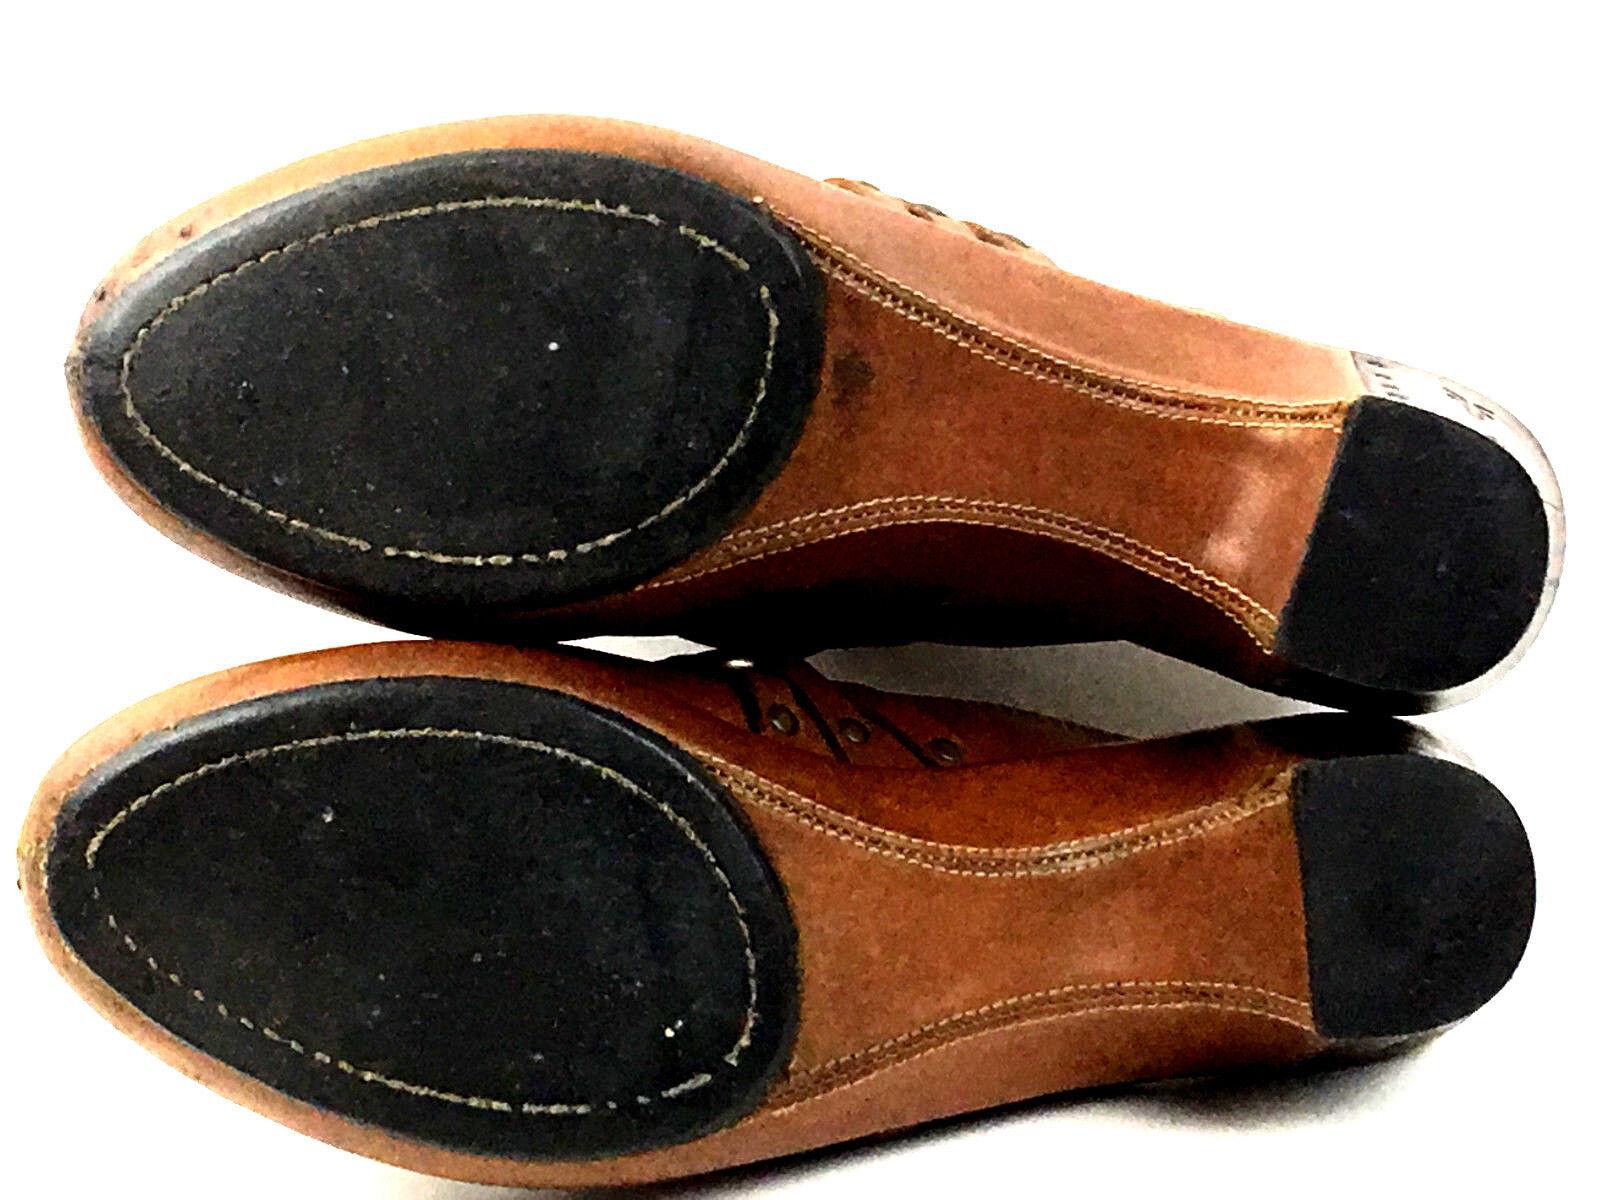 Frye 70121 Women's Clogs Mules Brown Size US.9 UK. UK. UK. 7 EU. 39-40 5d52c6